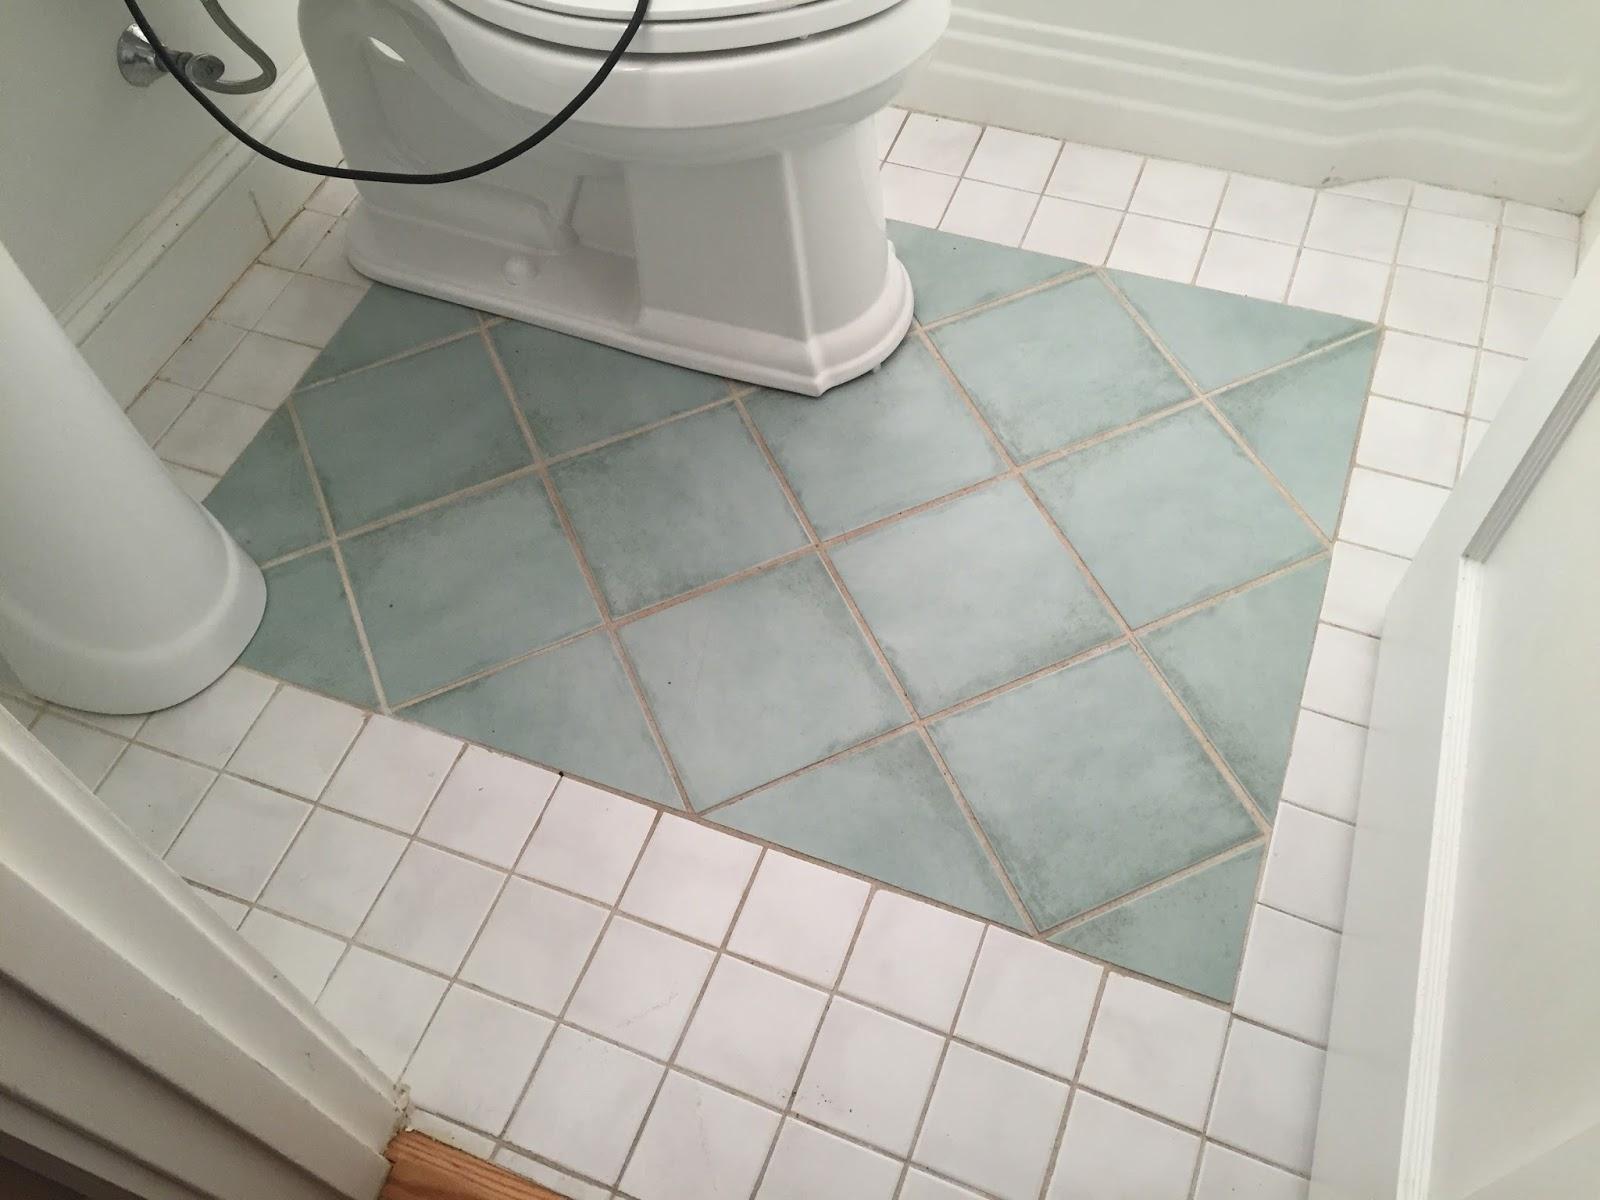 Luxury The floor before